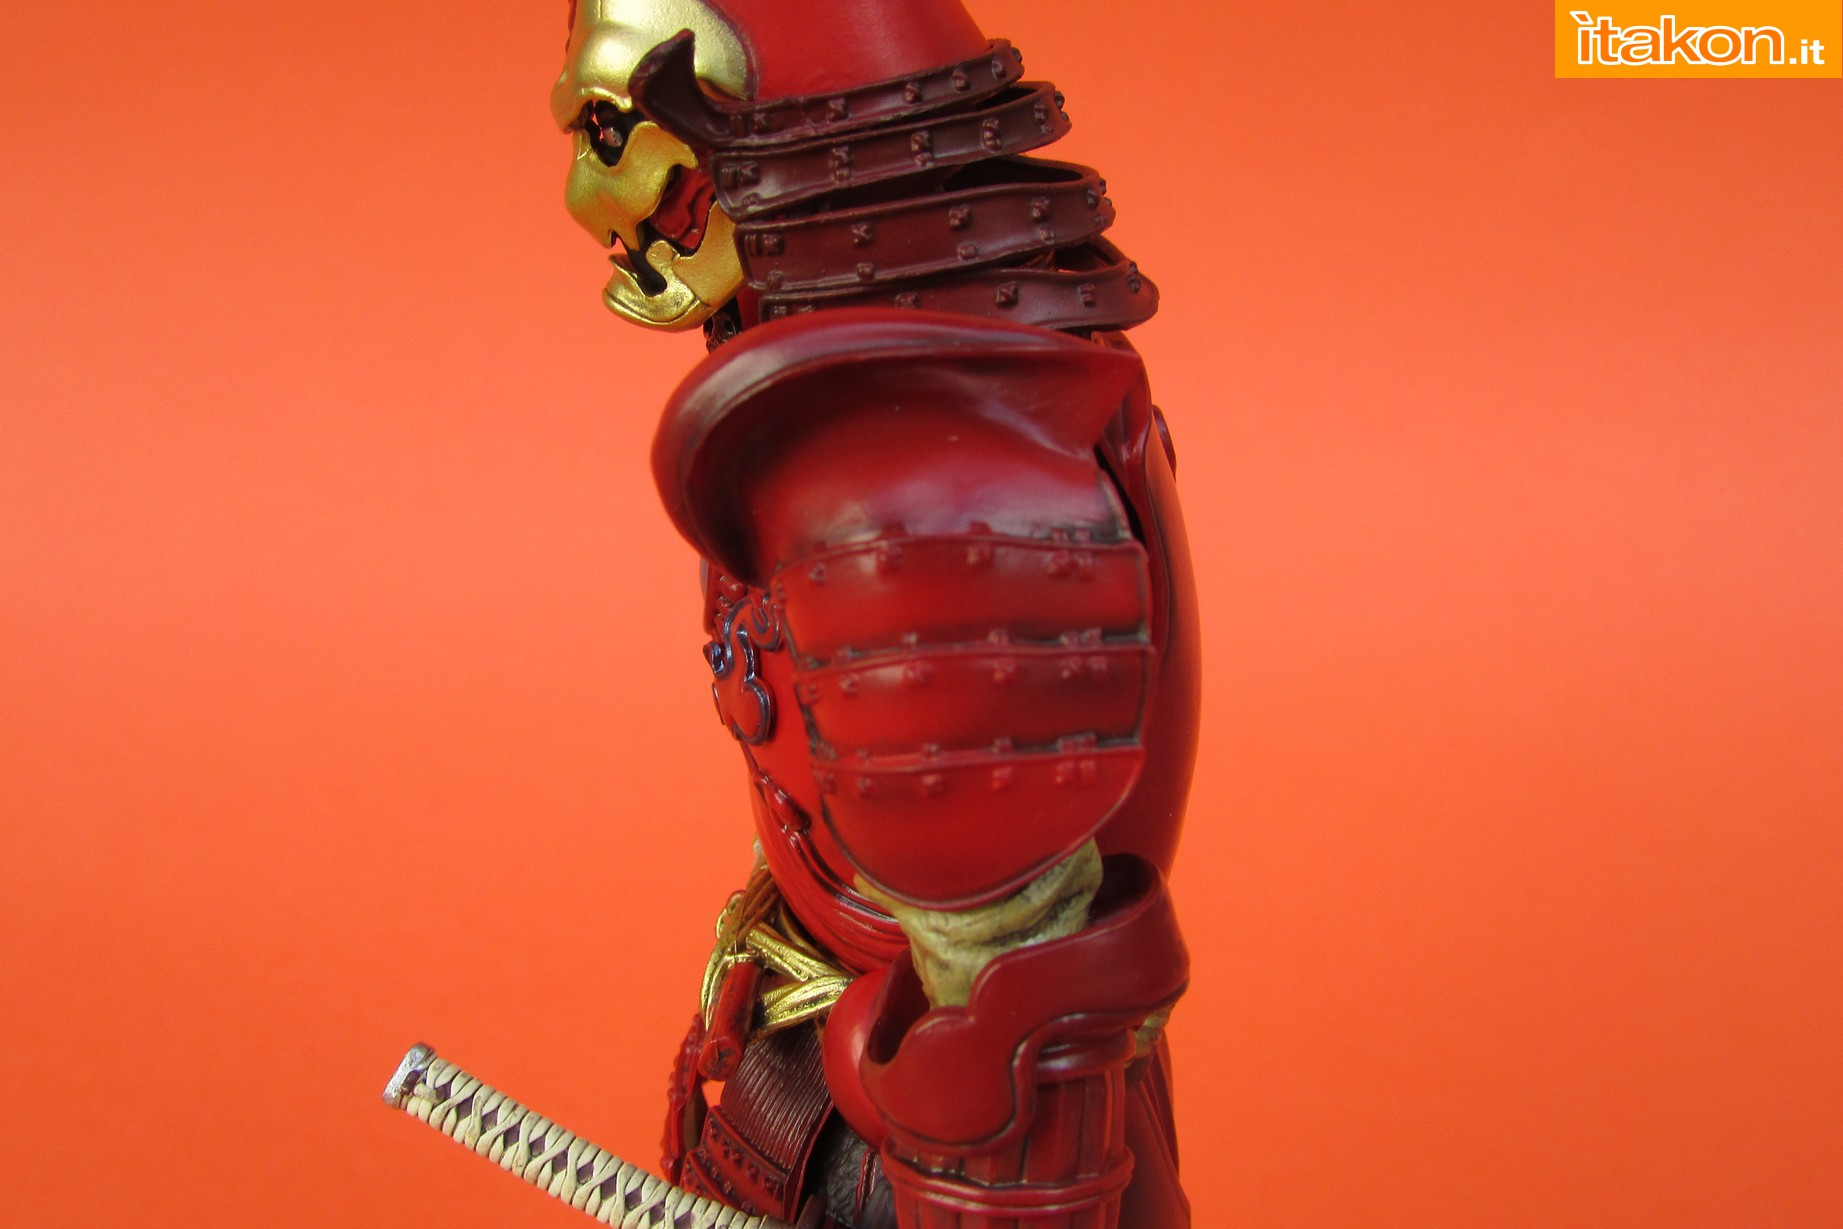 Link a Marvel Comics Koutetsu Samurai Iron Man Mark 3 Meishou MANGA REALIZATION review Bandai Itakon.it24